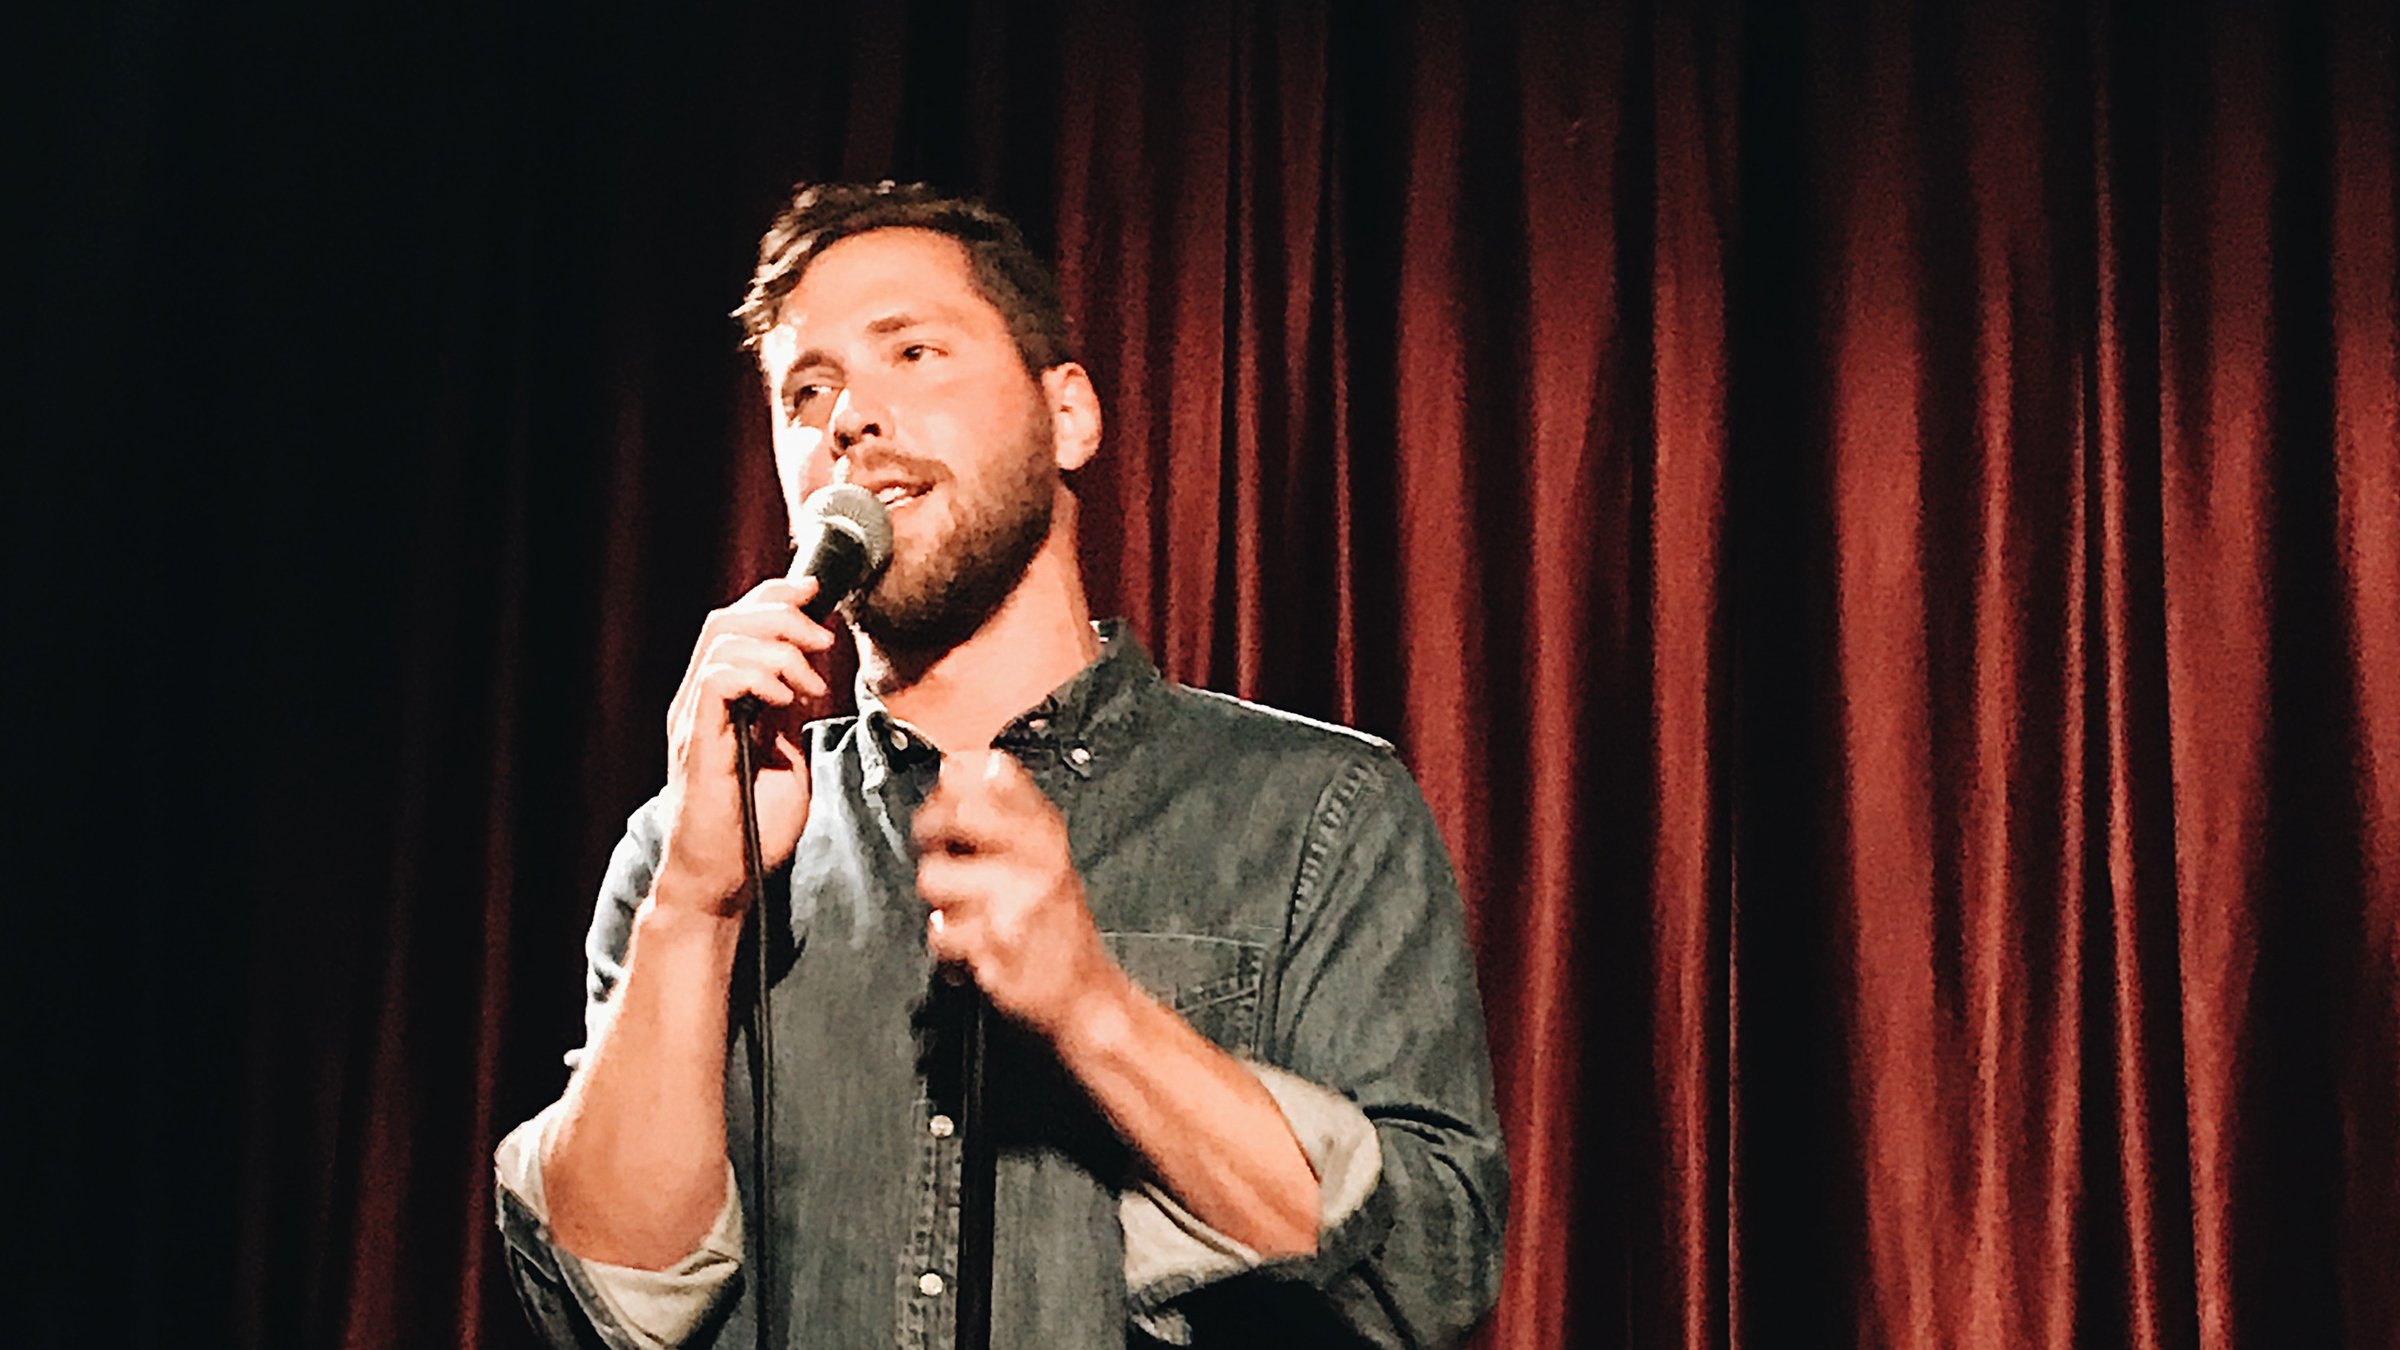 Amuse Bouche comedy night at Melody Wine Bar Virgil Village Karl Hess